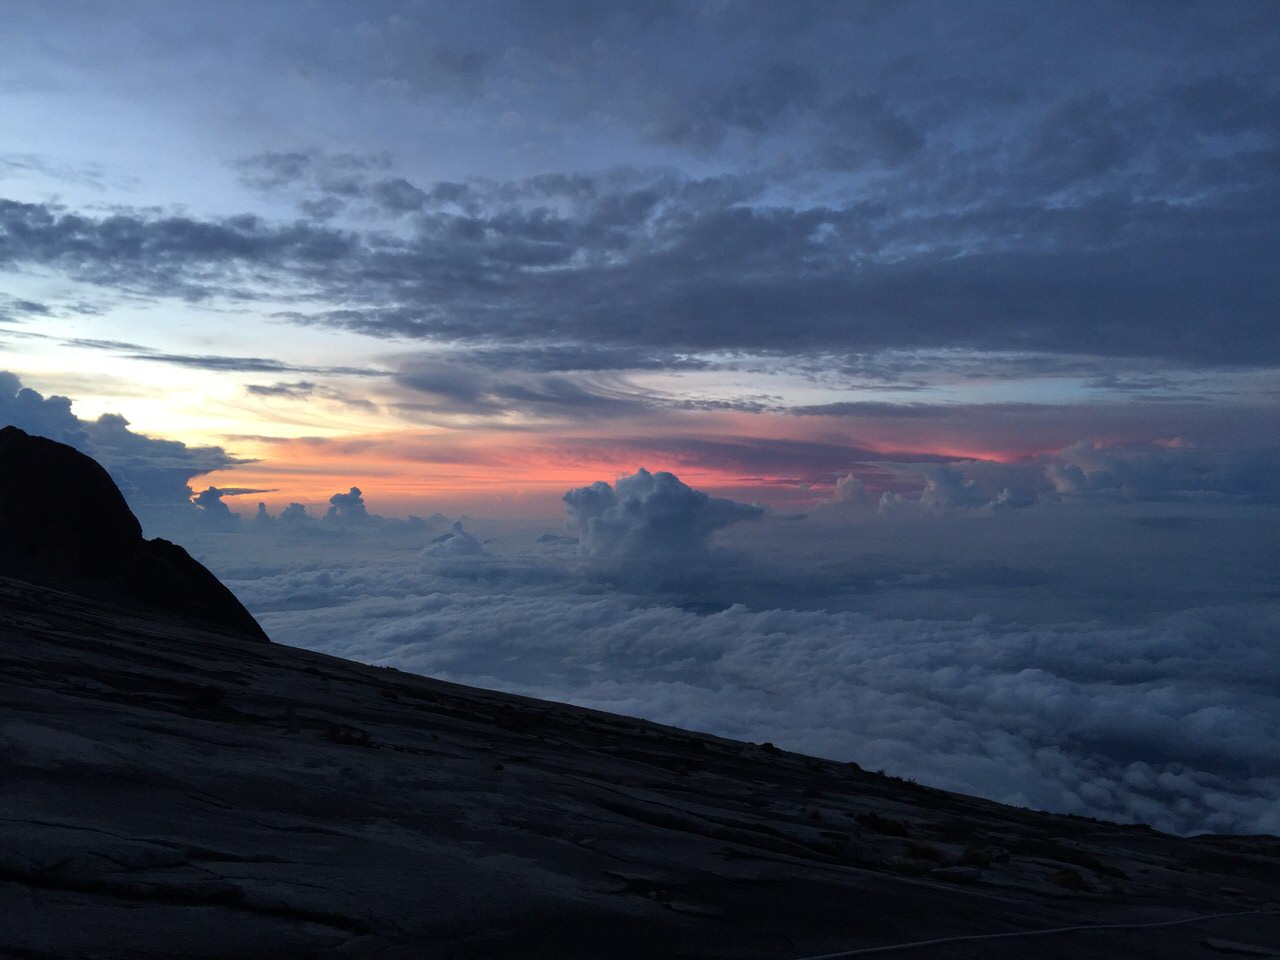 Kota Kinabalu climbing 4152